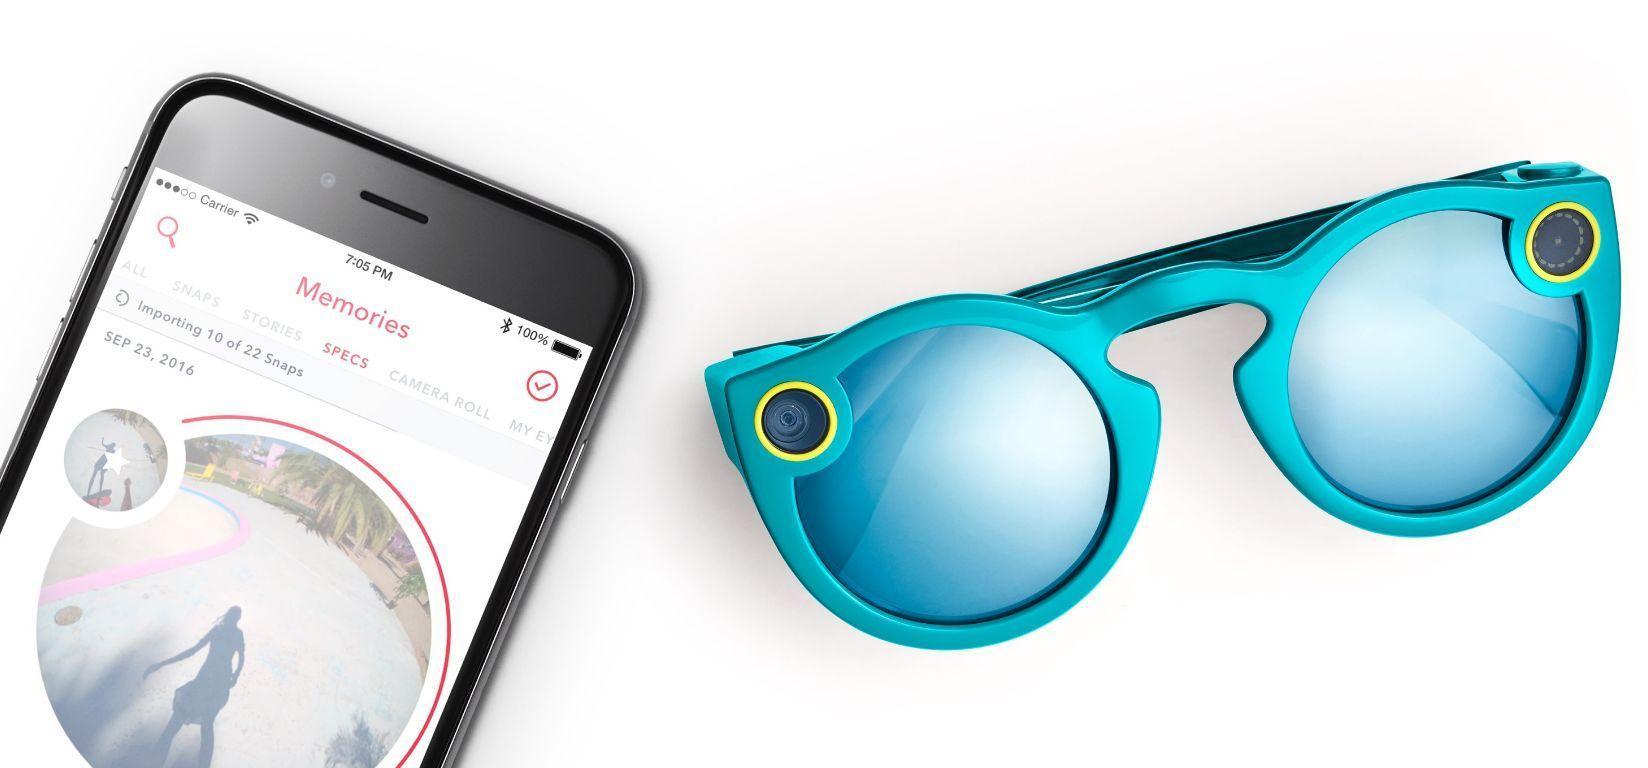 Brillene kobles til mobilen trådløst og tar opp video i rundt format.